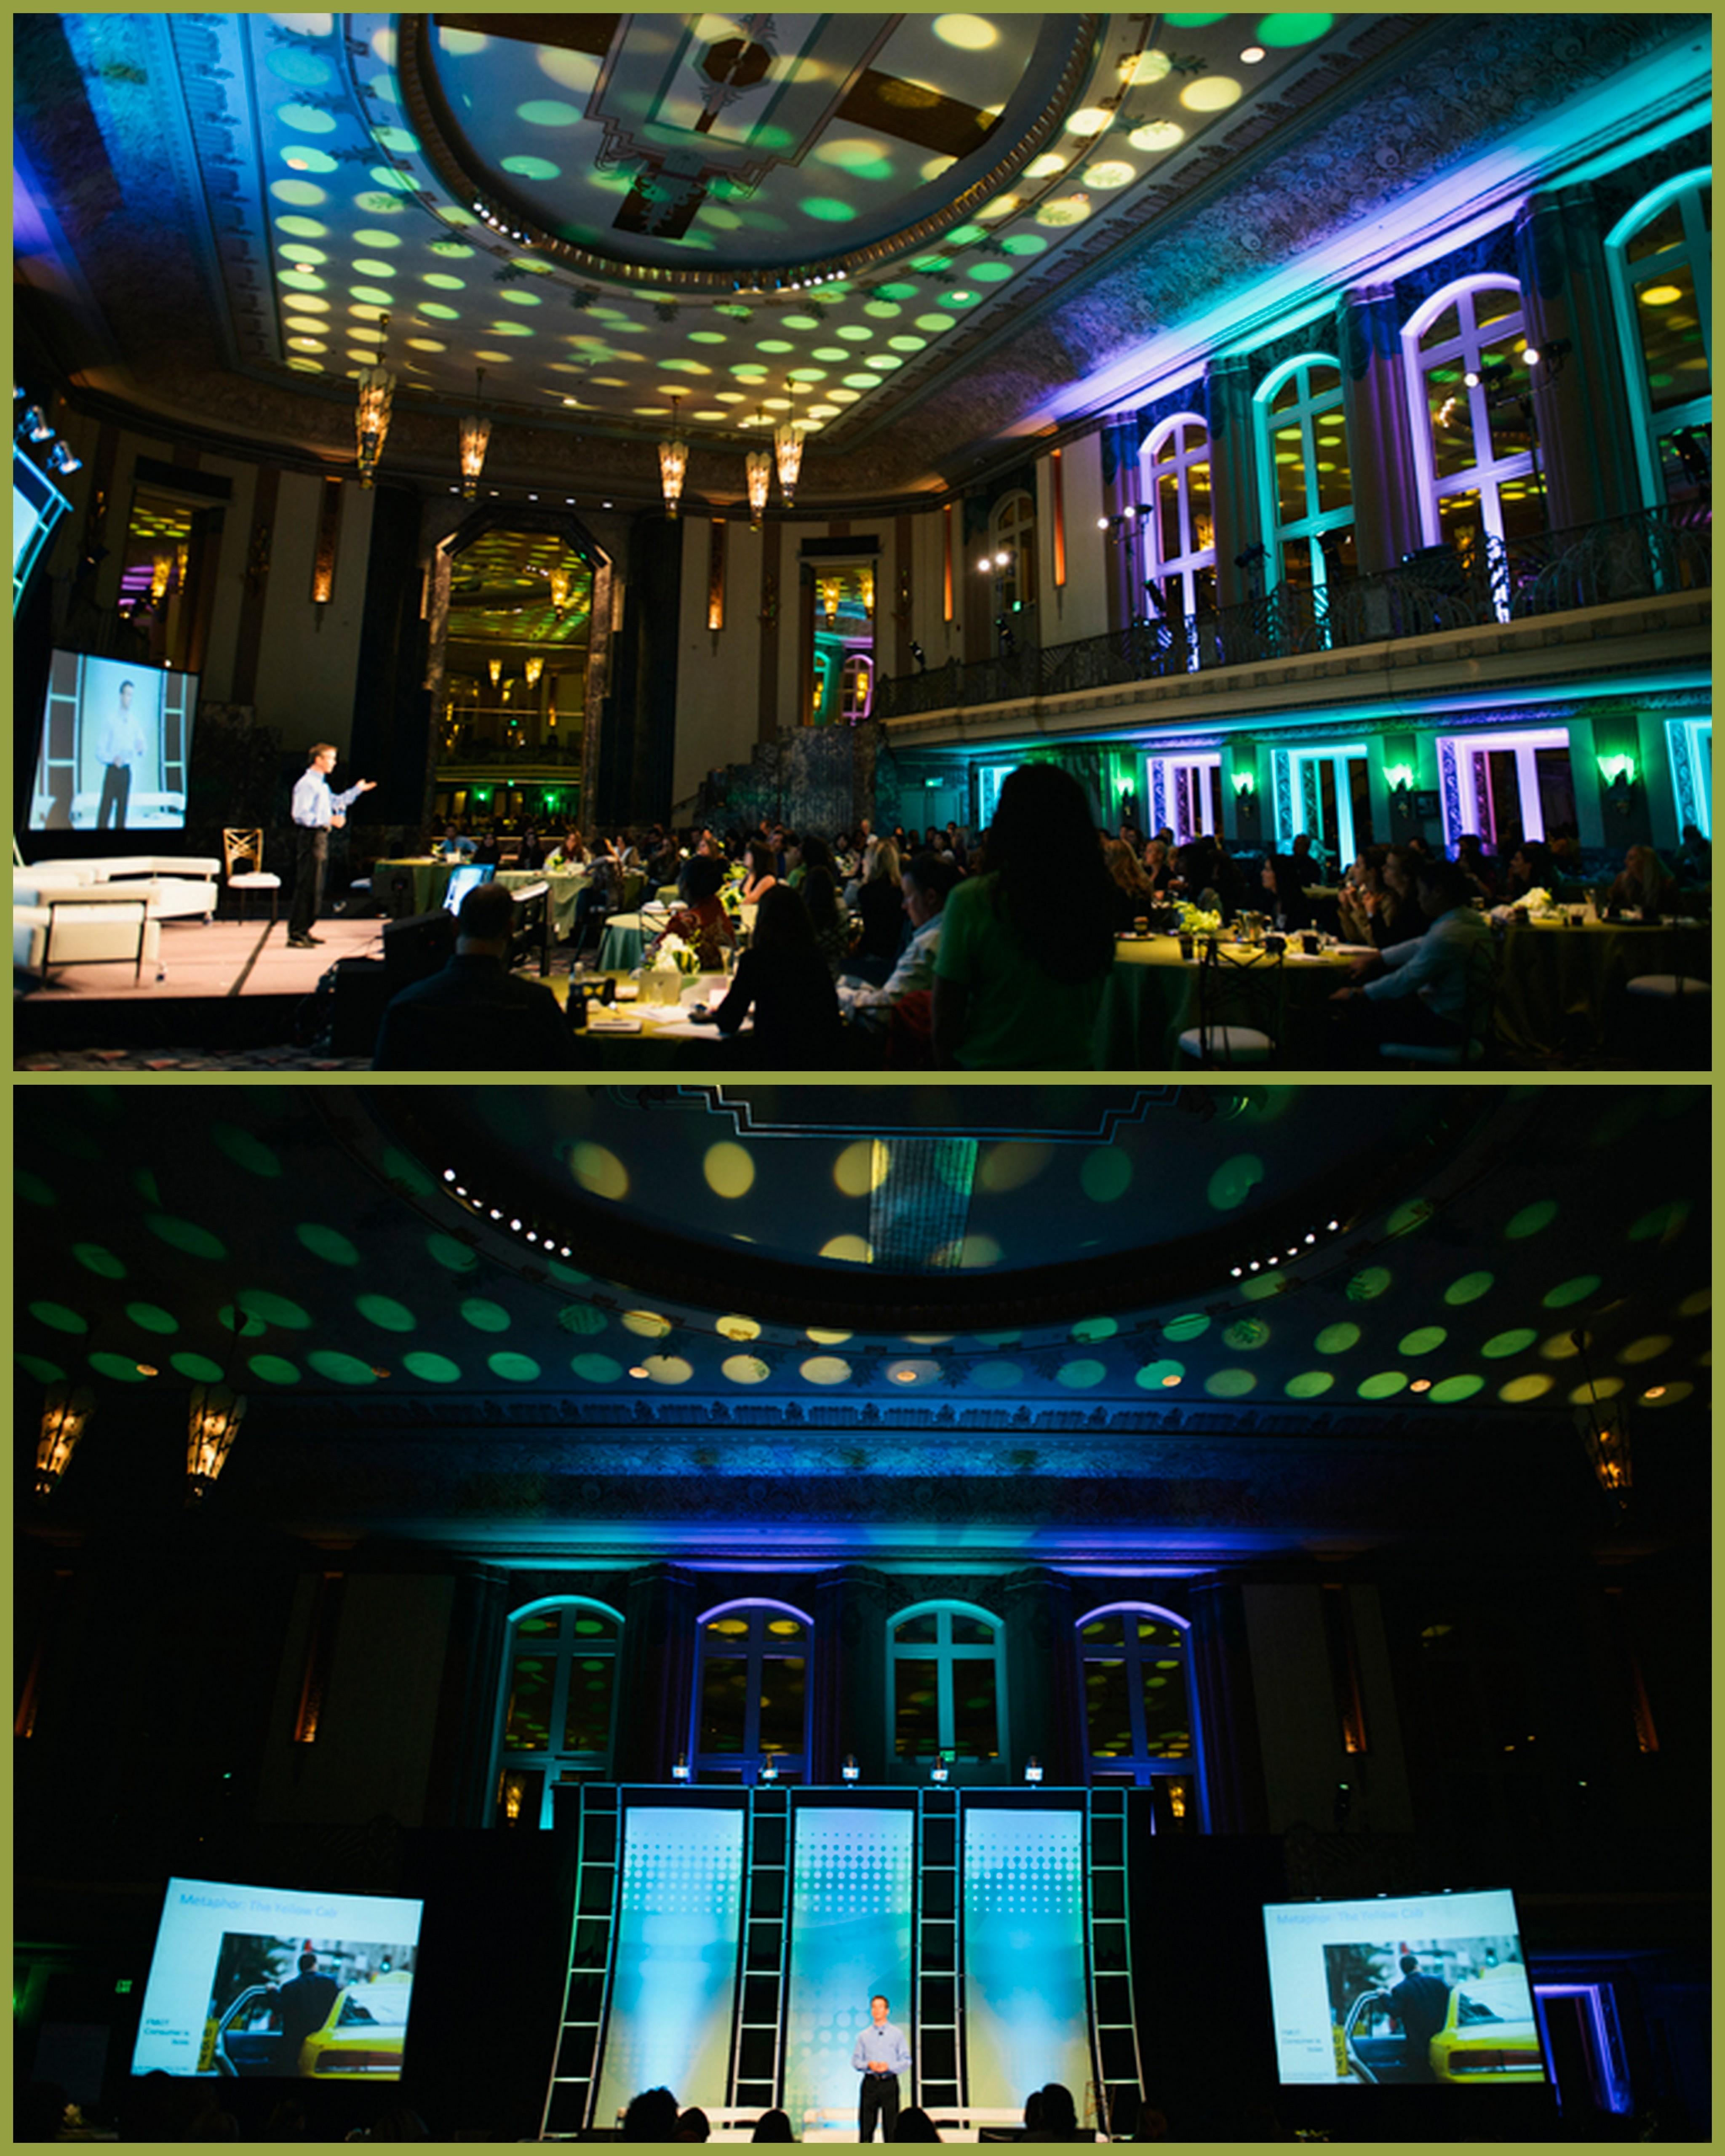 Goodwin Lighting | Hilton Netherland Plaza | viva bella events | Dora Manuel  sc 1 st  Viva Bella Events & Not your everyday corporate meeting... Viva Bella Events ... azcodes.com